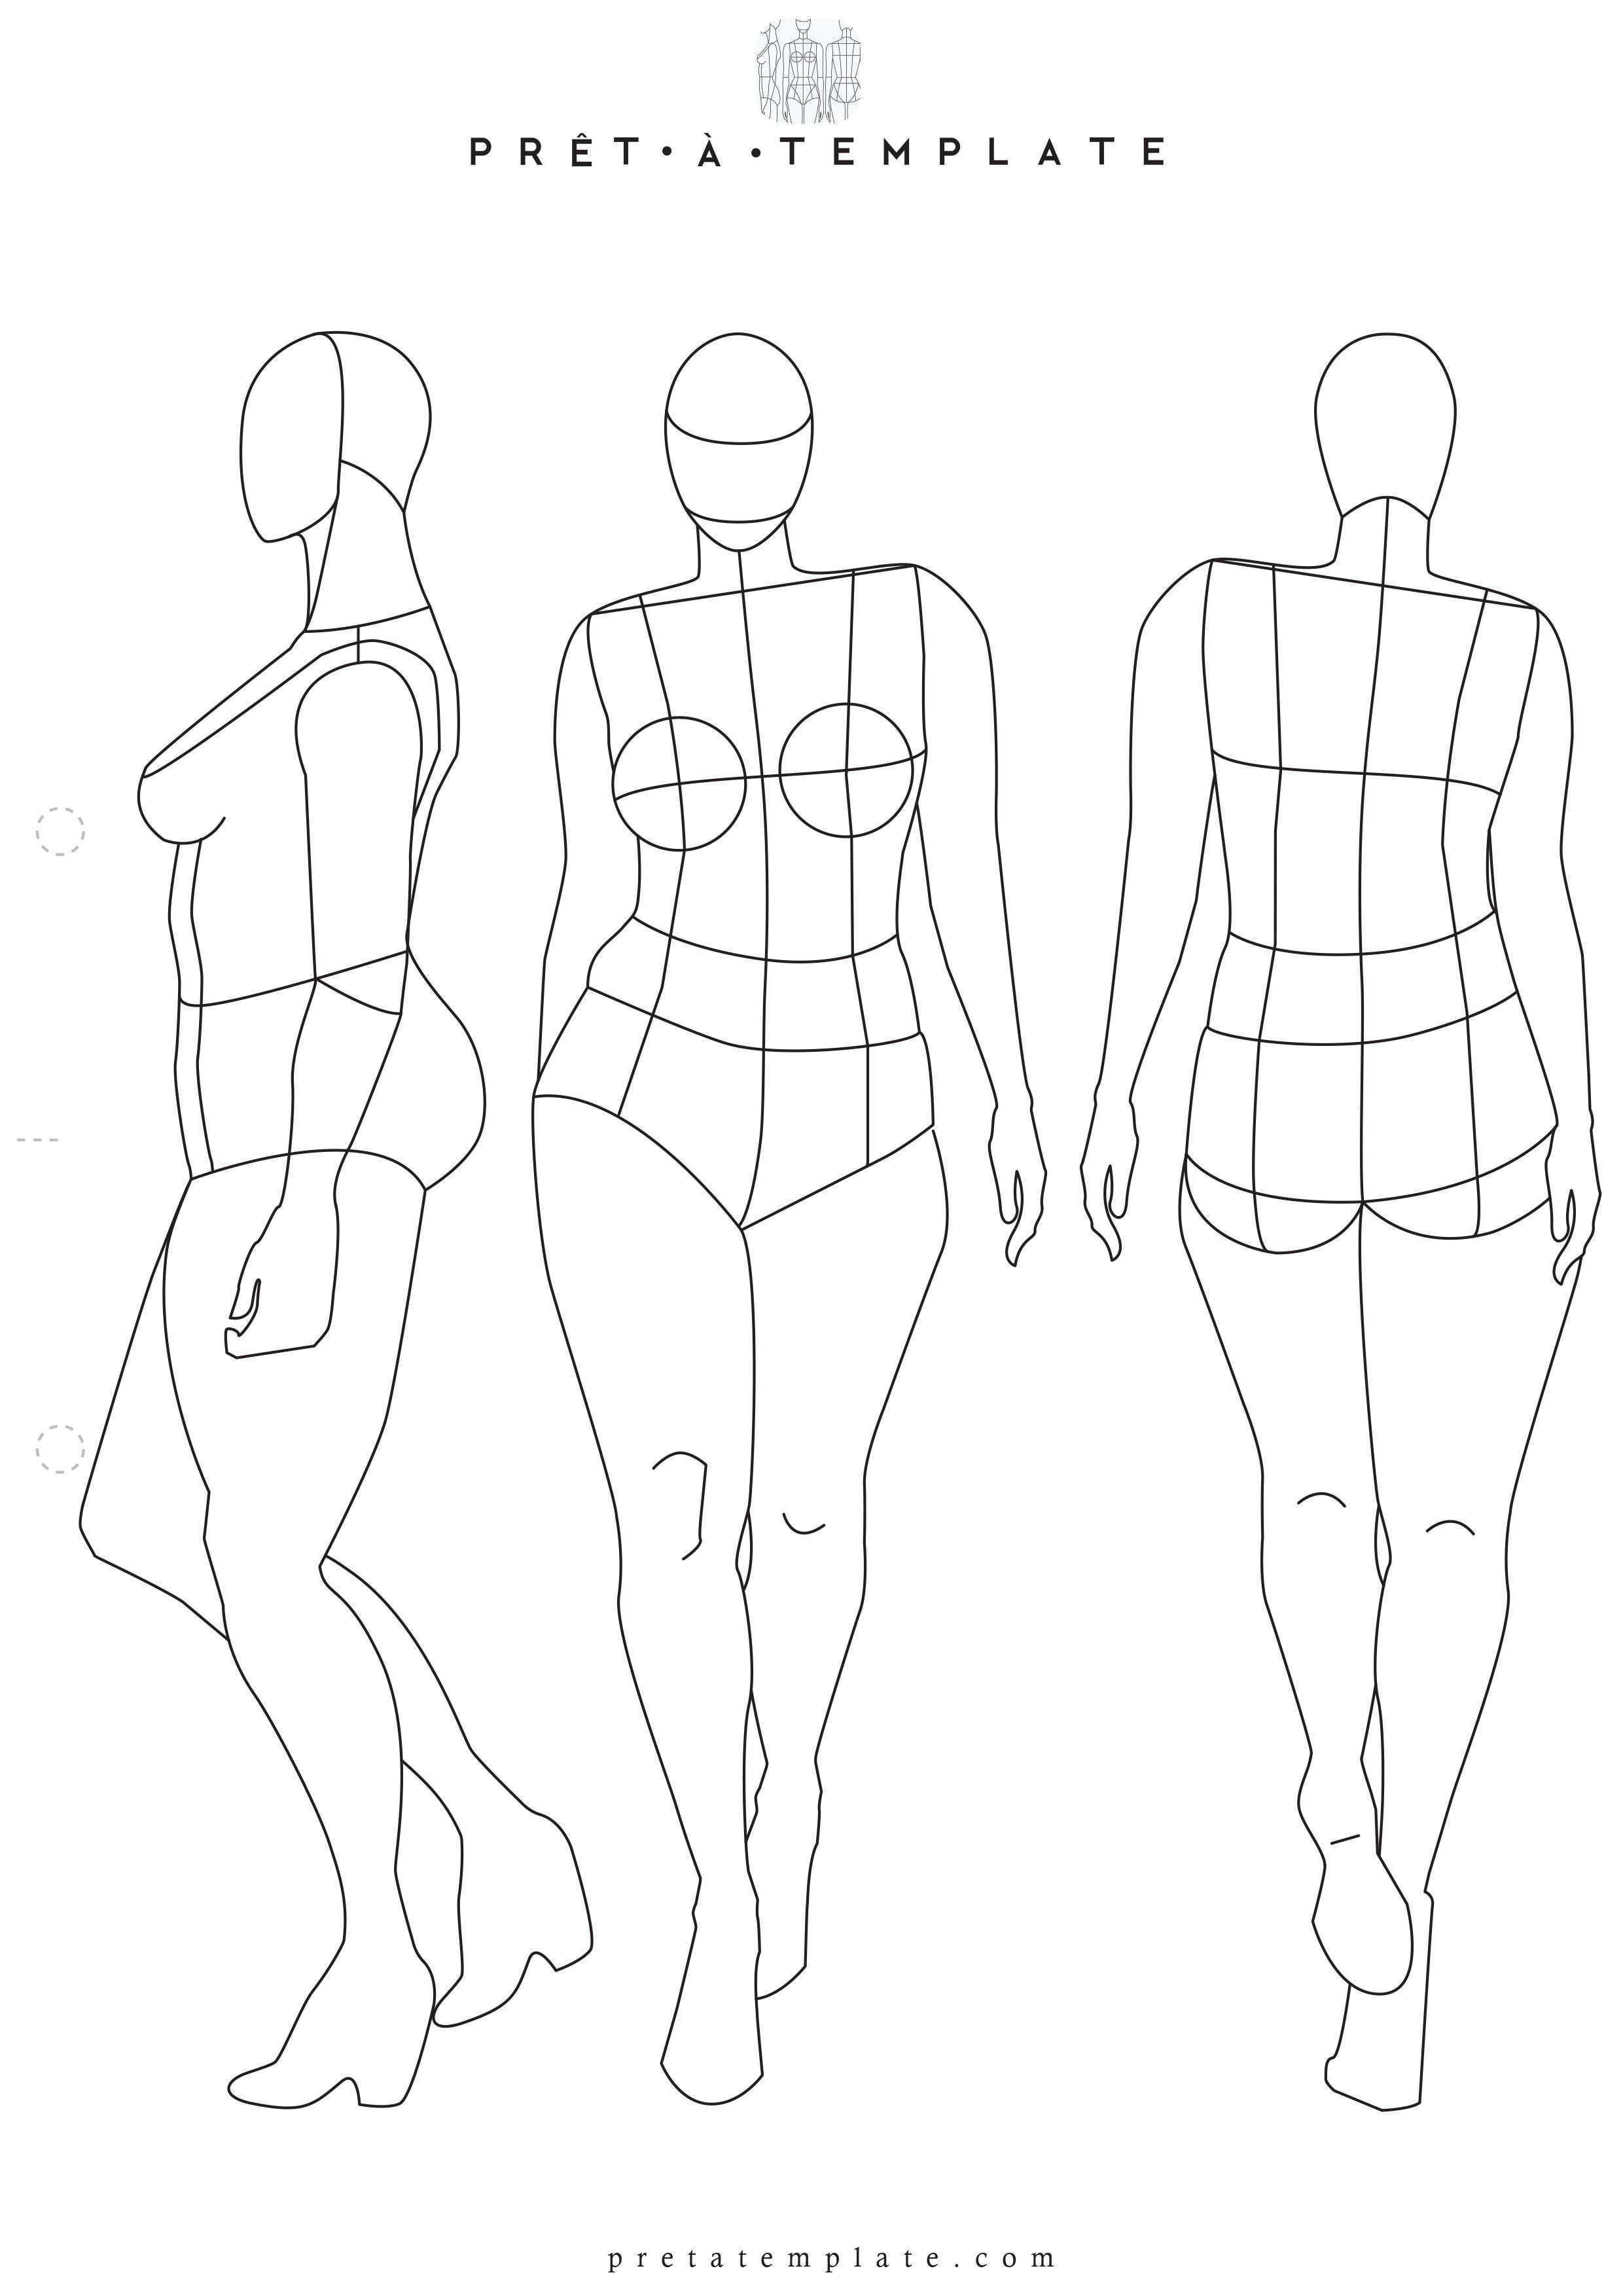 Pin On Printable Templates Fashion Figure Templates Fashion Design App